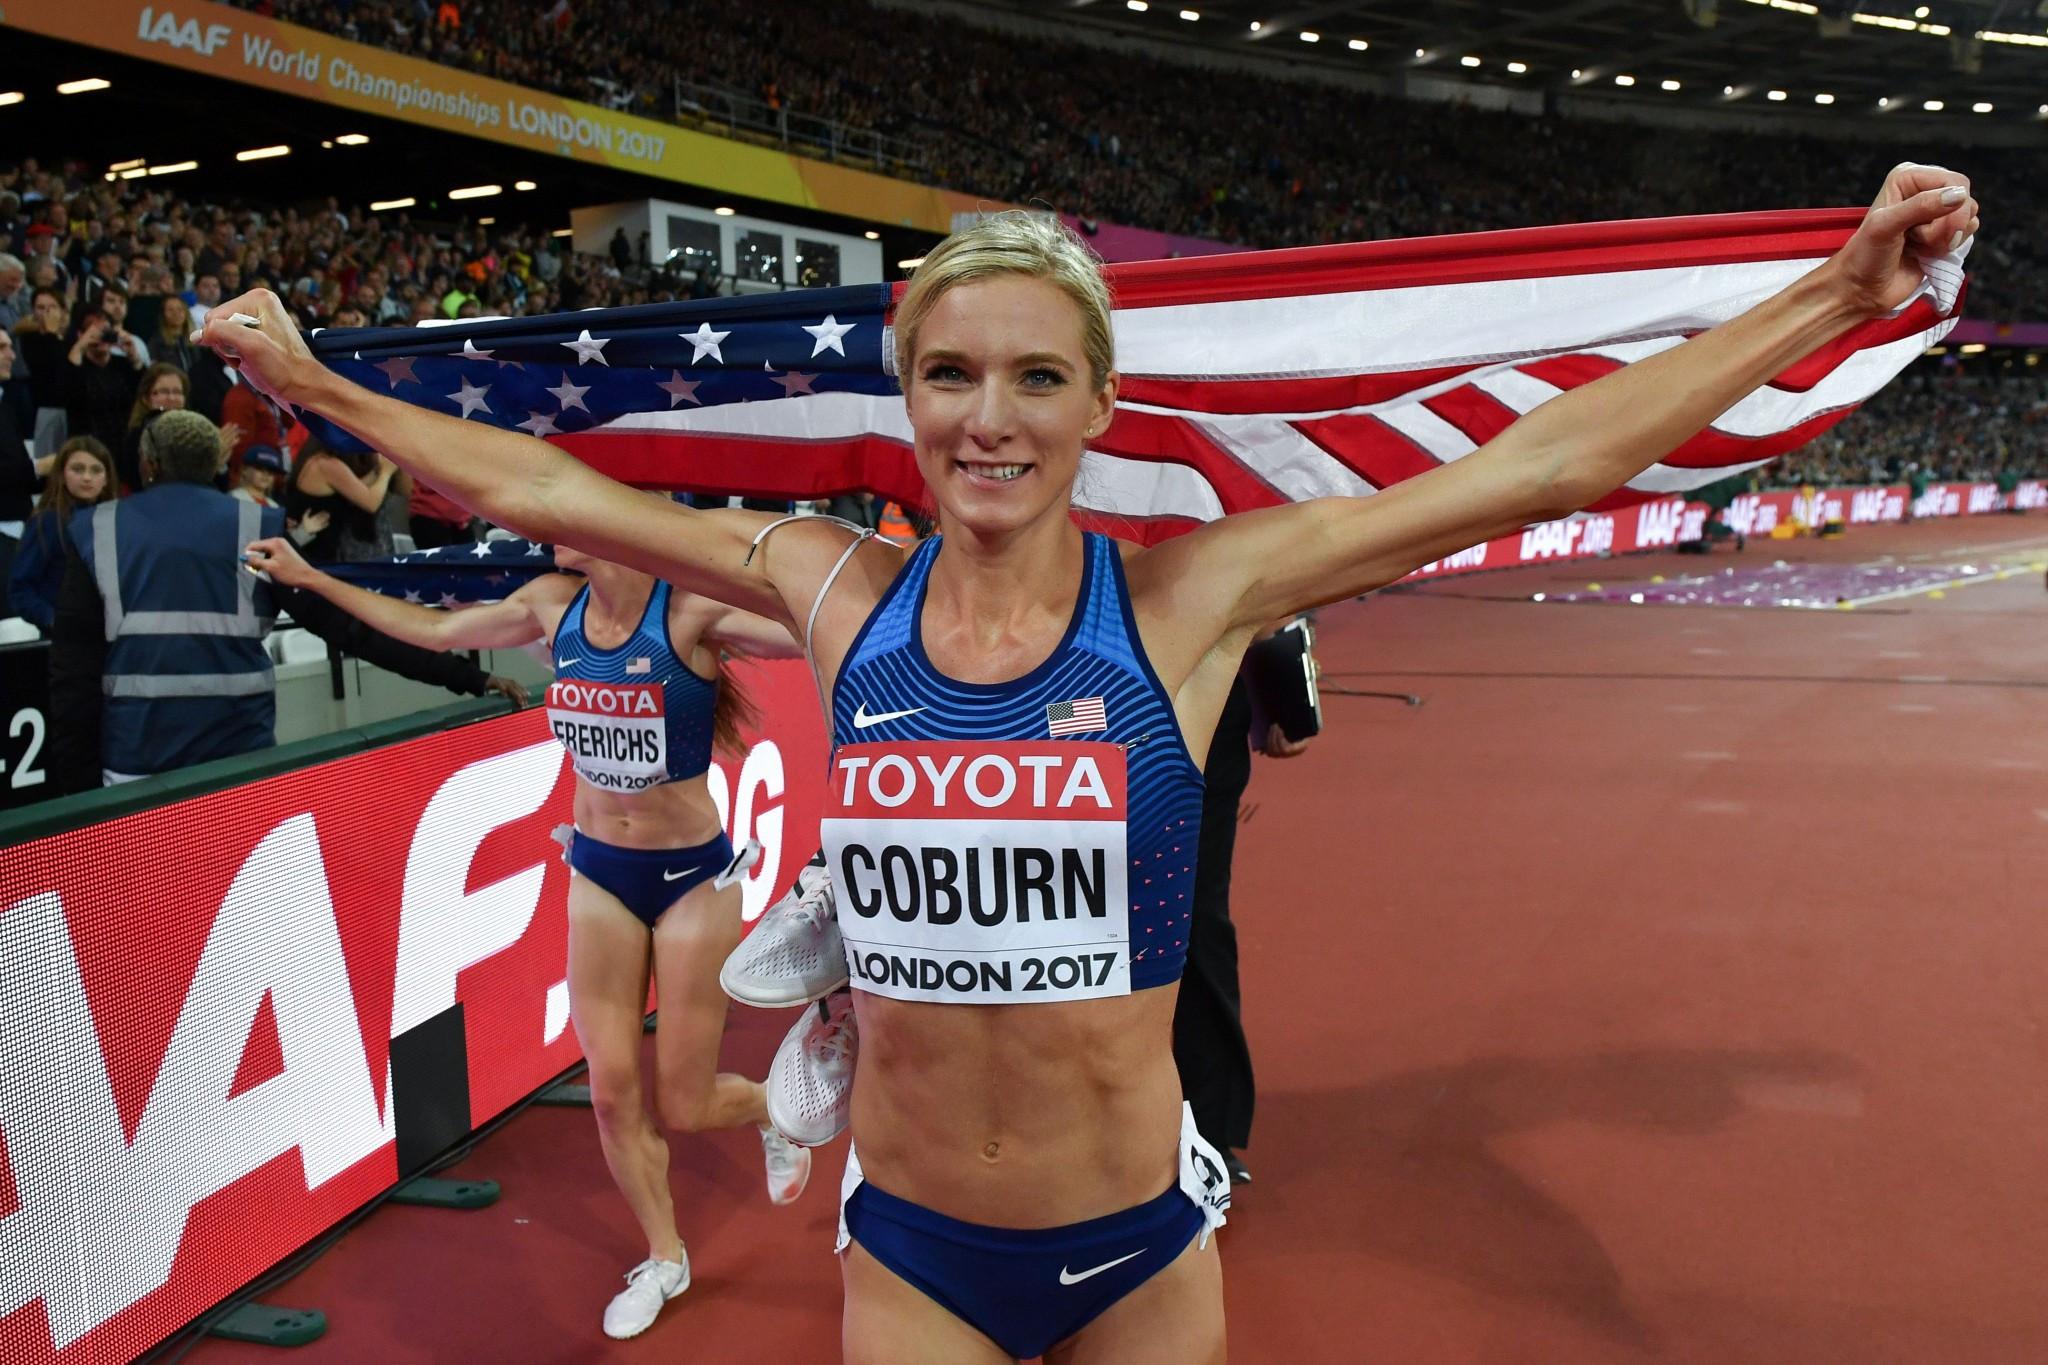 Coburn wins 3,000m steeplechase at IAAF World Championships after Kenyan misses water jump